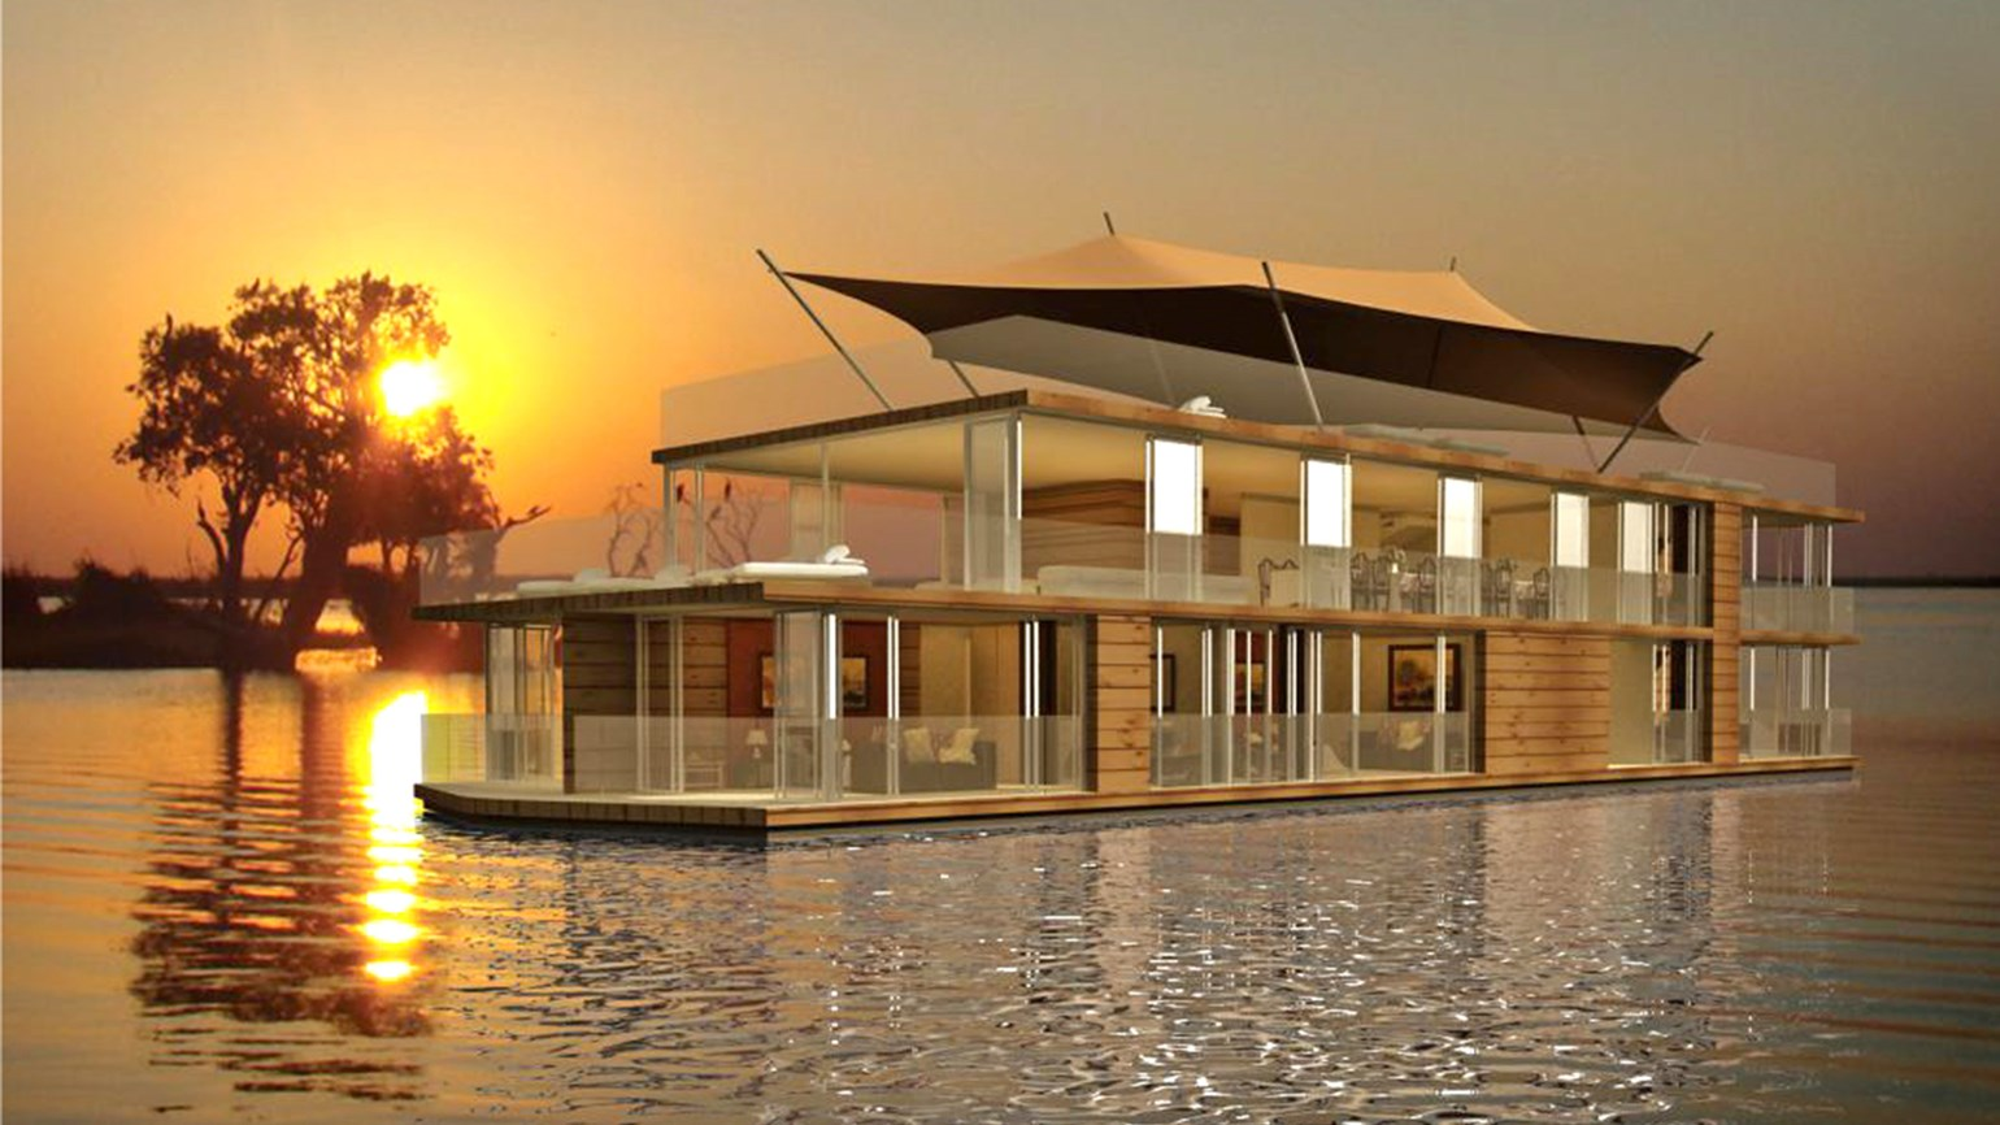 CroisiEurope Building Ship For ZambeziChobe River Cruises Travel - Chobe river